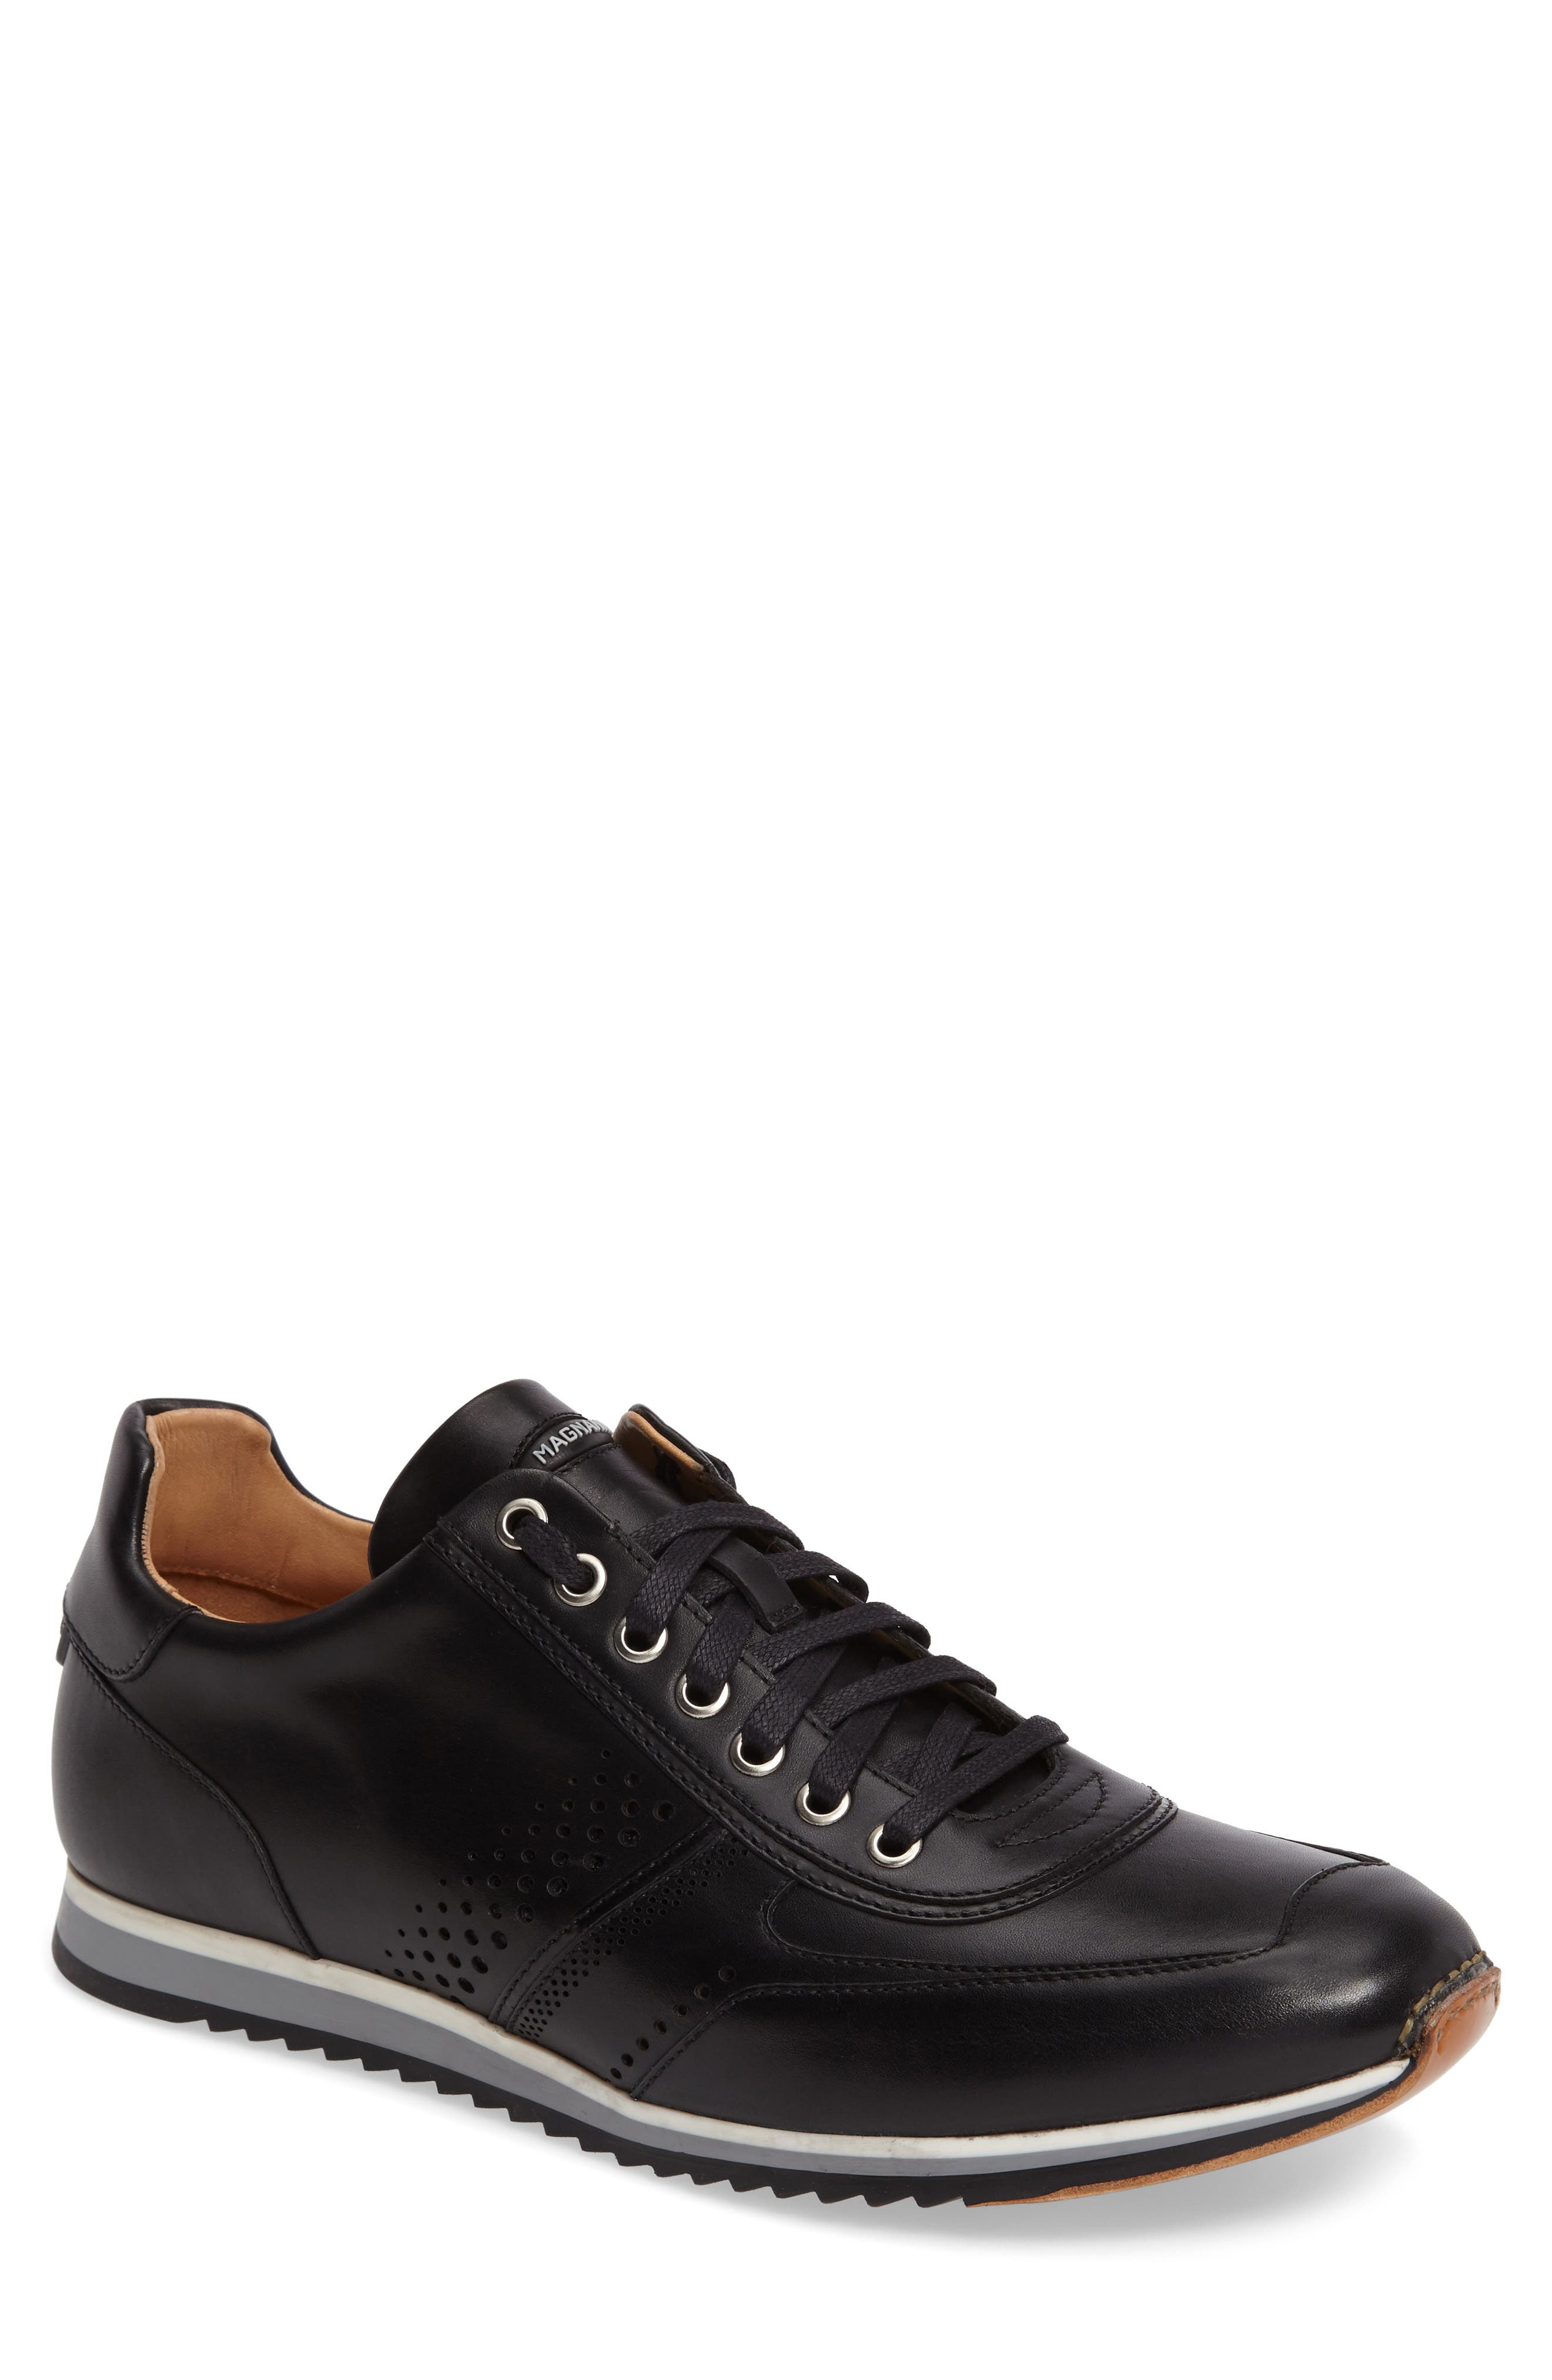 Main Image - Magnanni 'Cristian' Sneaker (Men)